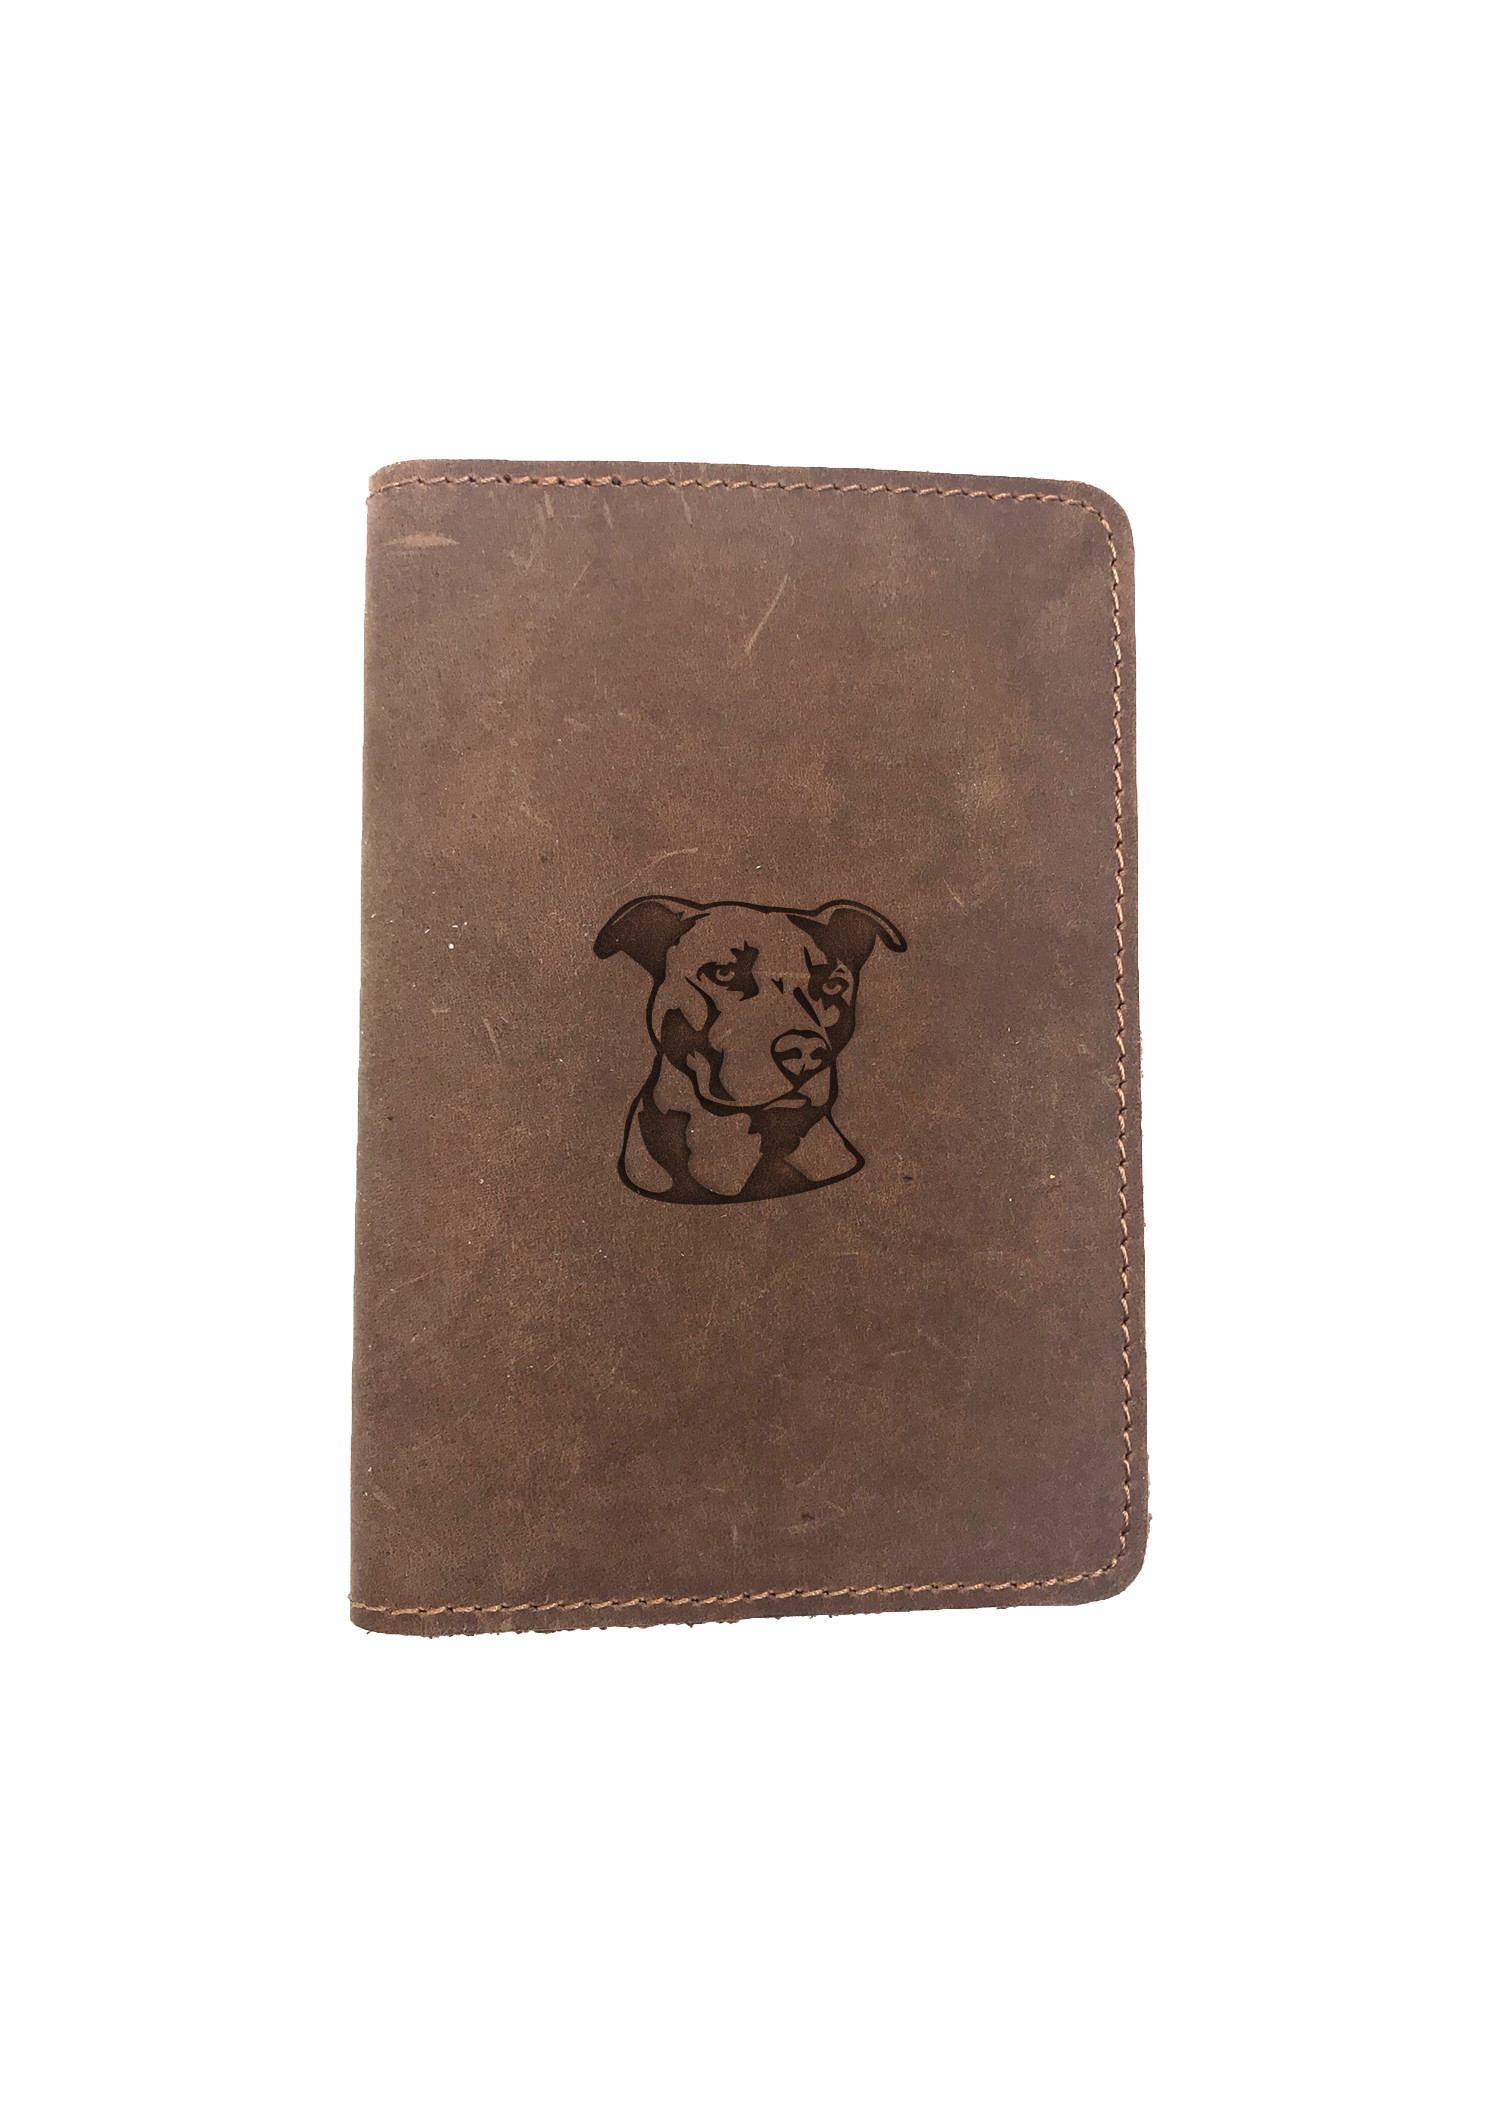 Passport Cover Bao Da Hộ Chiếu Da Sáp Khắc Hình HÌnh PITBULL FACE STENCIL ART (BROWN)